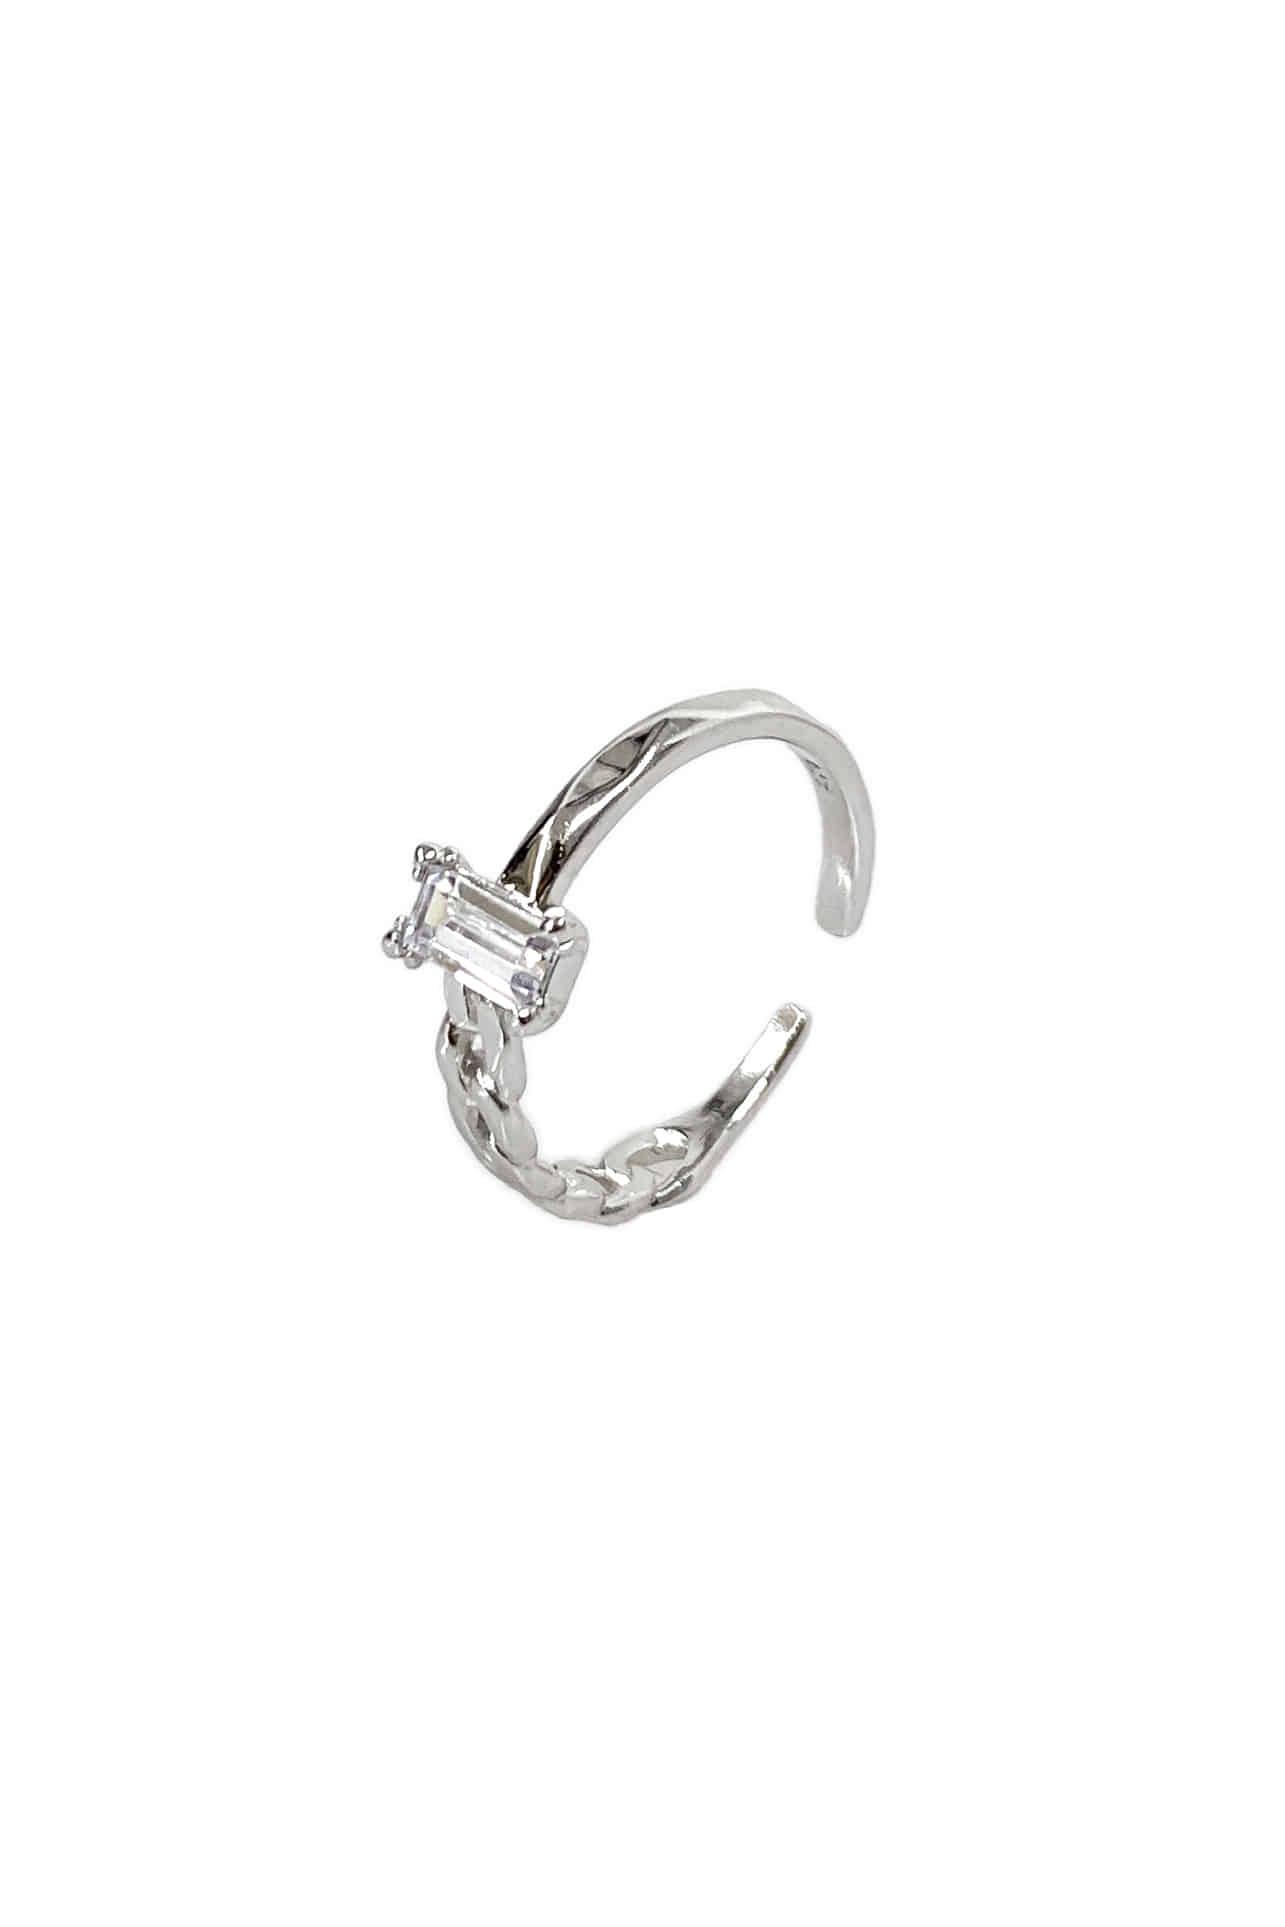 [silver925] 하프 체인 스퀘어 반지